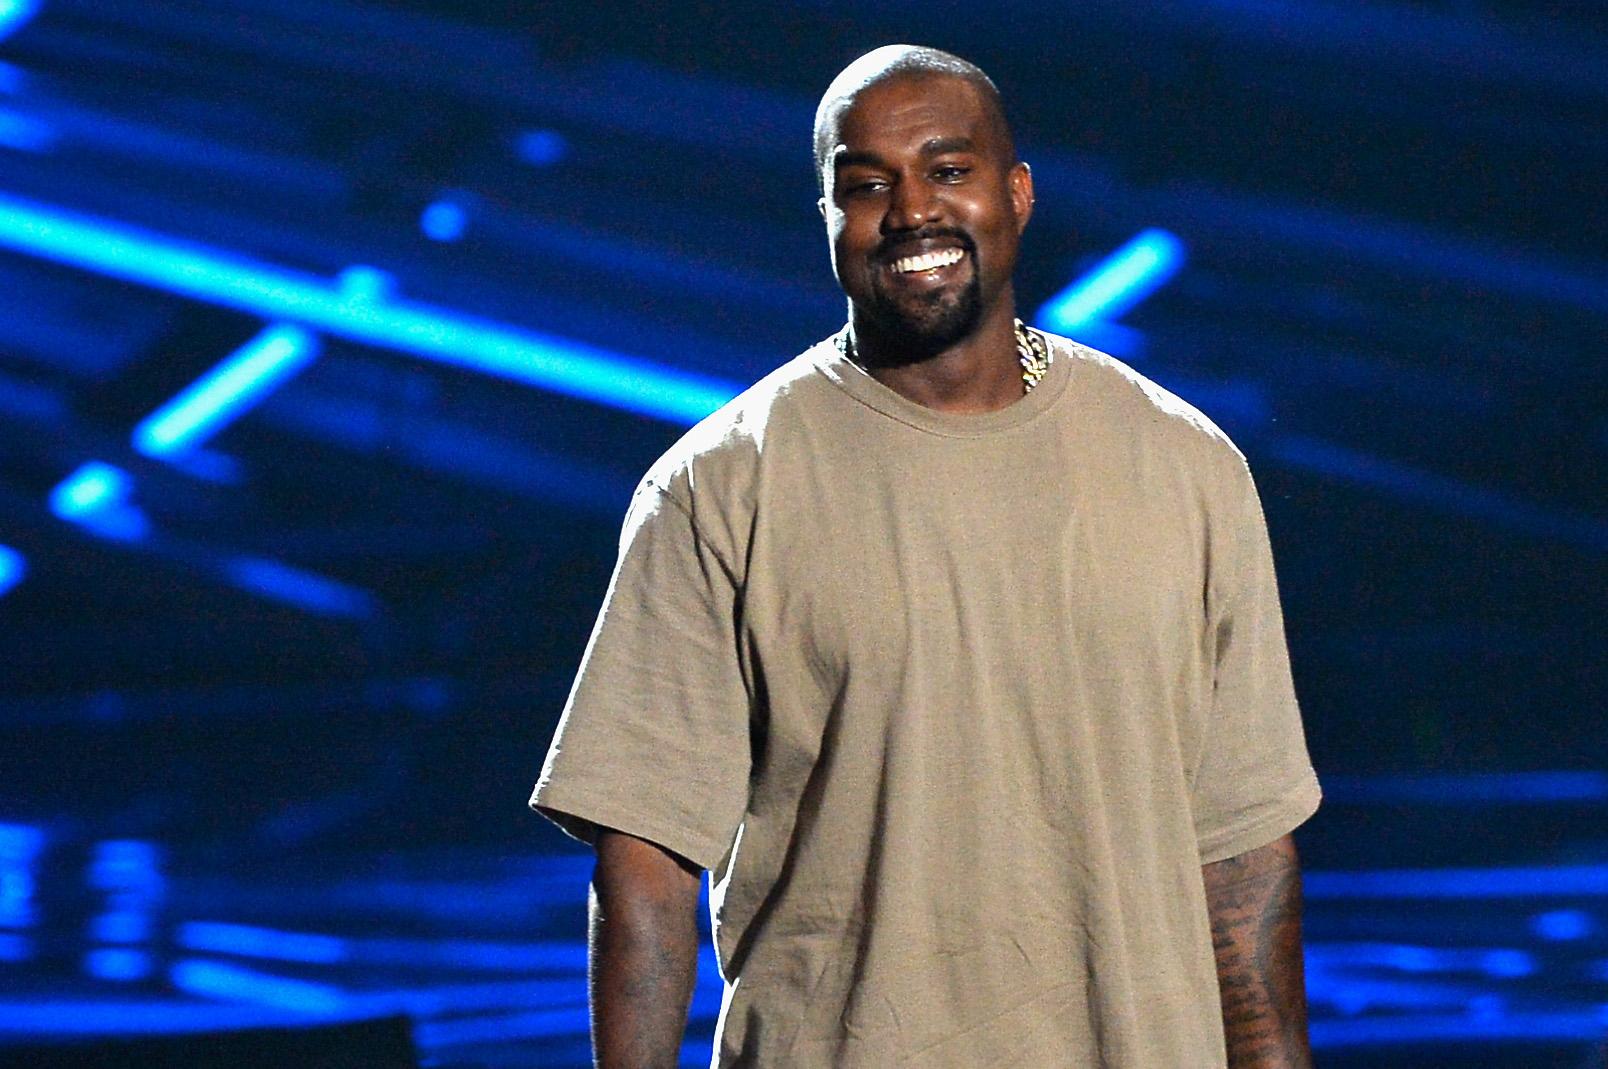 Kanye West accepts his Vanguard Award.